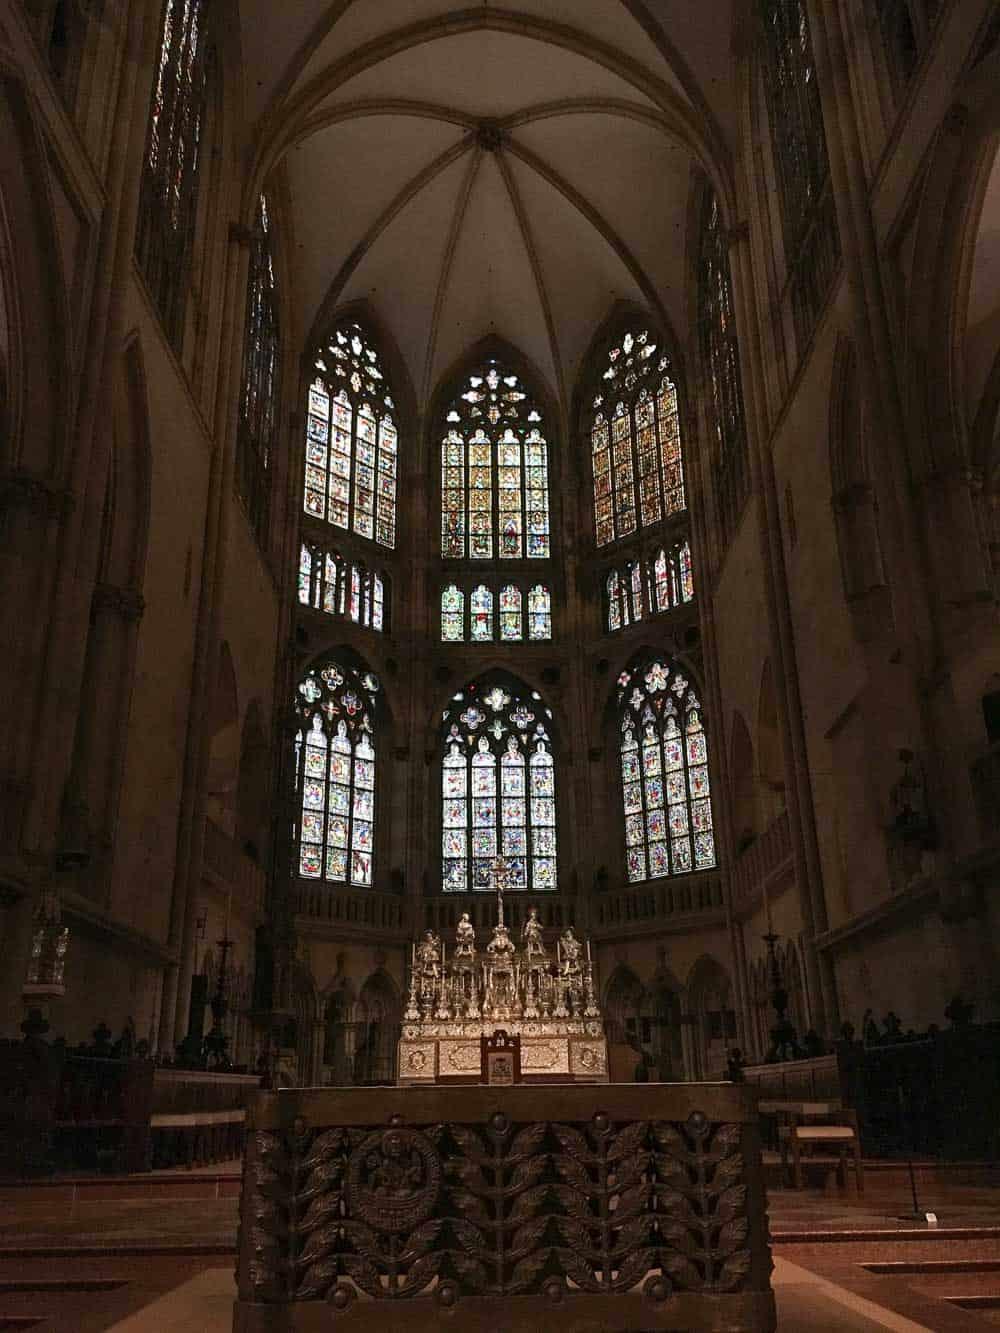 Regensburg ST. PETER'S CATHEDRAL